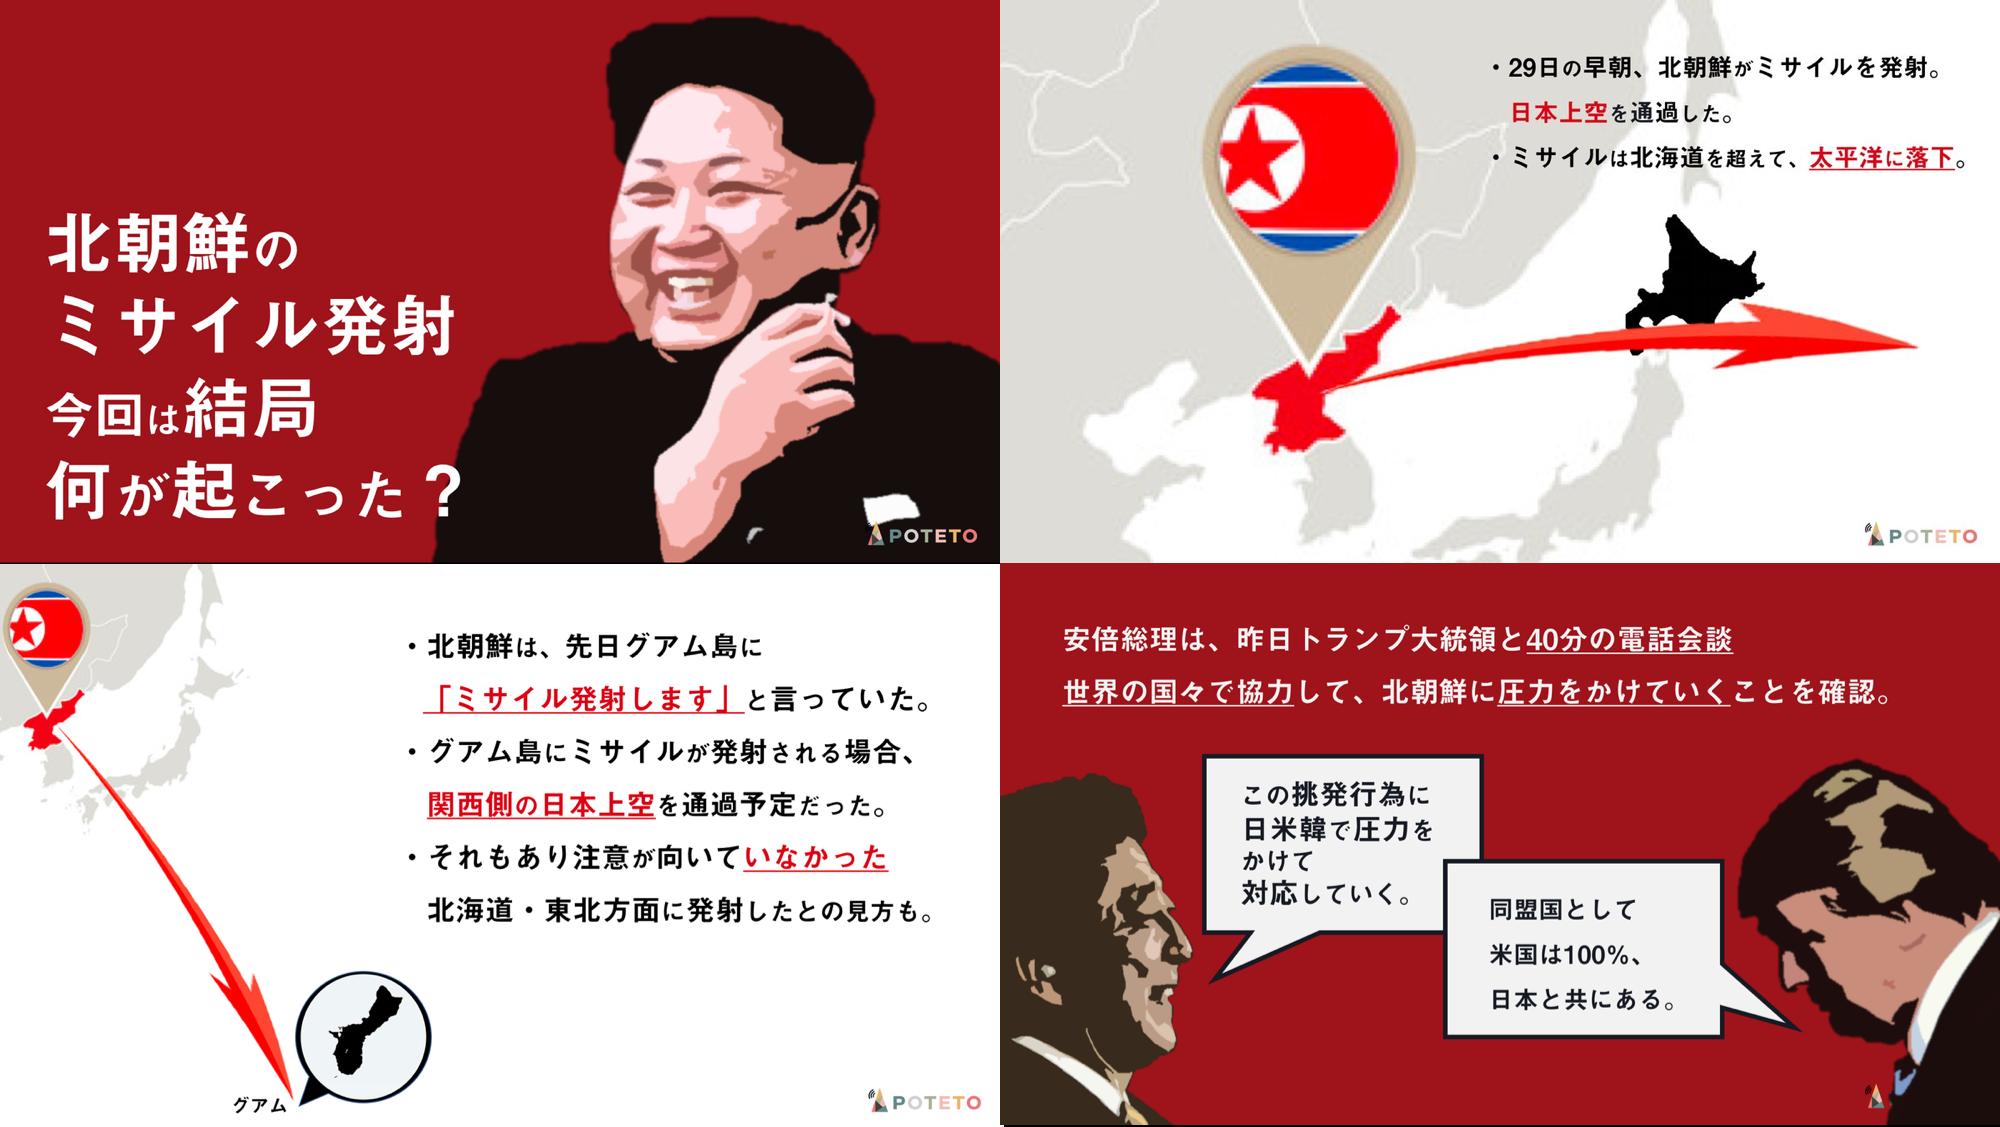 0830 1 - 2017.08.30 <p>朝日新聞のイチメンニュース